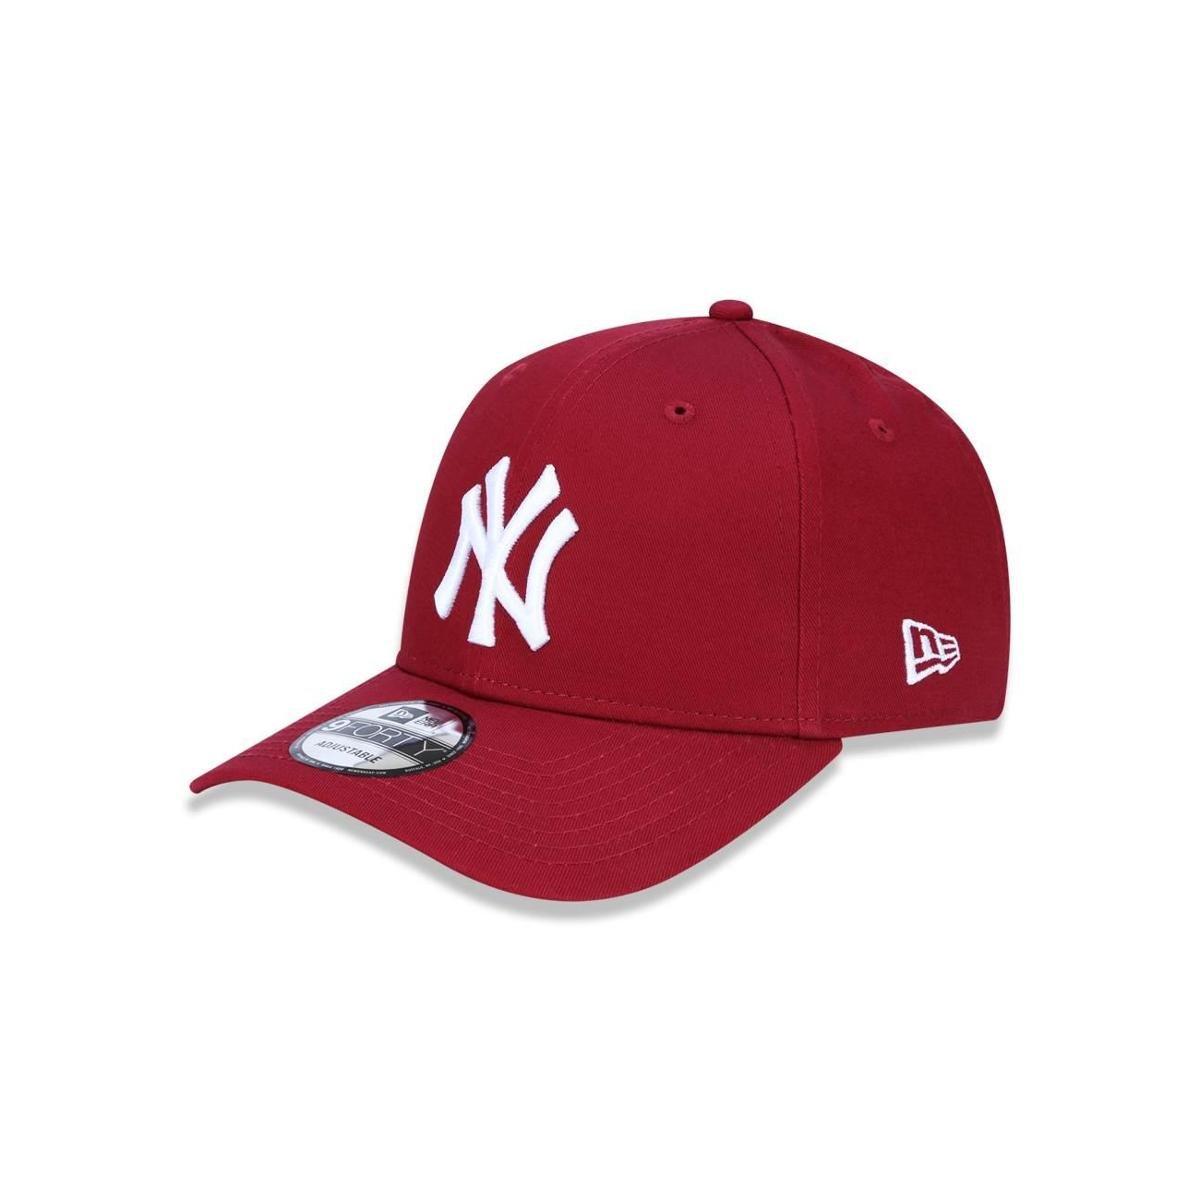 Boné 940 New York Yankees MLB Aba Curva Snapback New Era - Compre Agora  4d4c0ac53a3